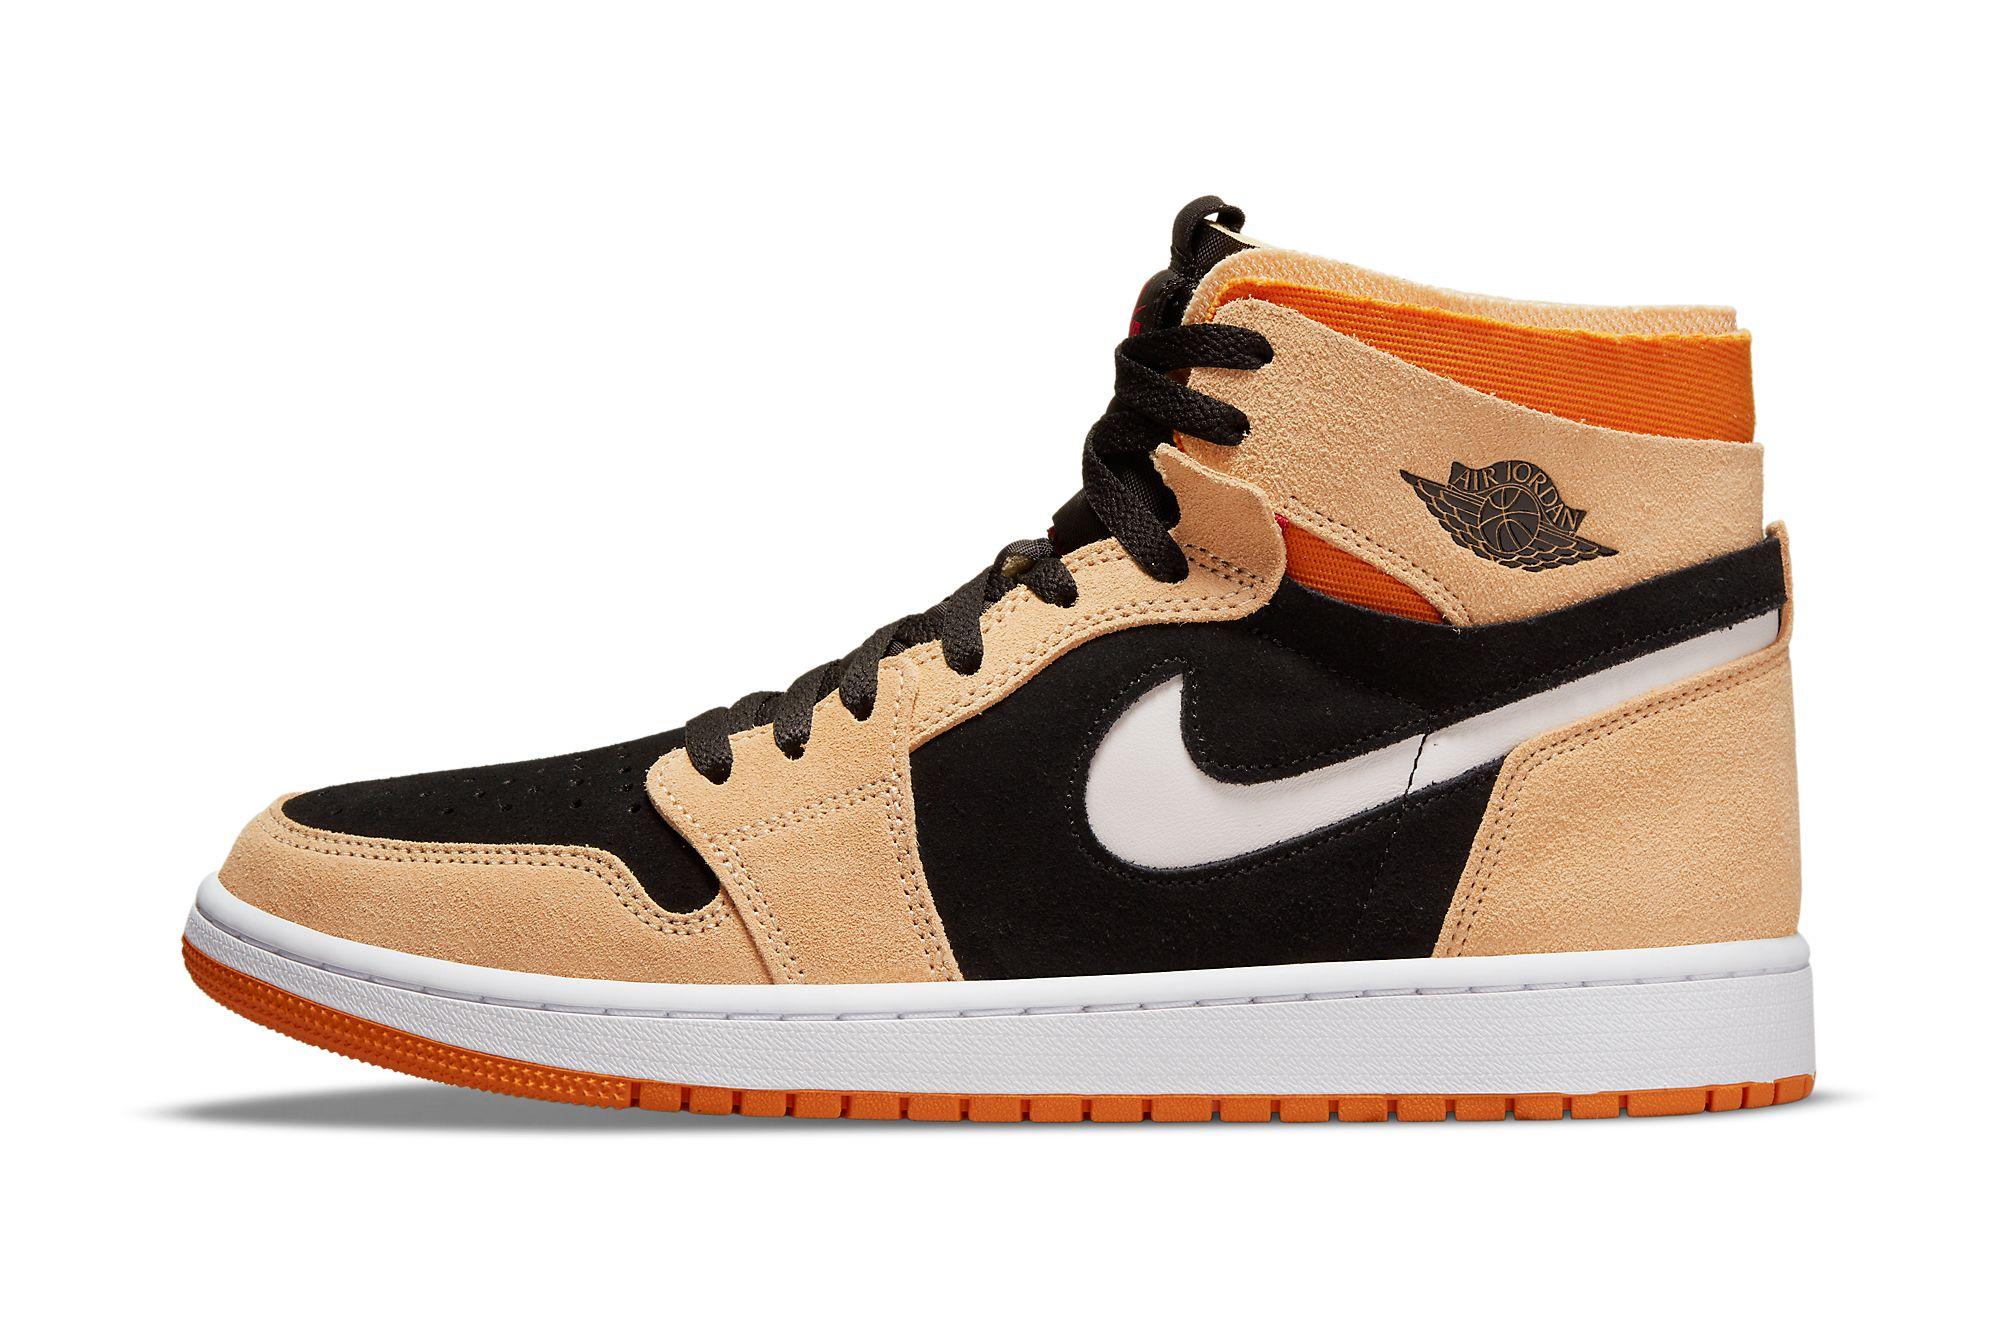 Air Jordan 1 High Zoom CMFT 'Pumpkin Spice'